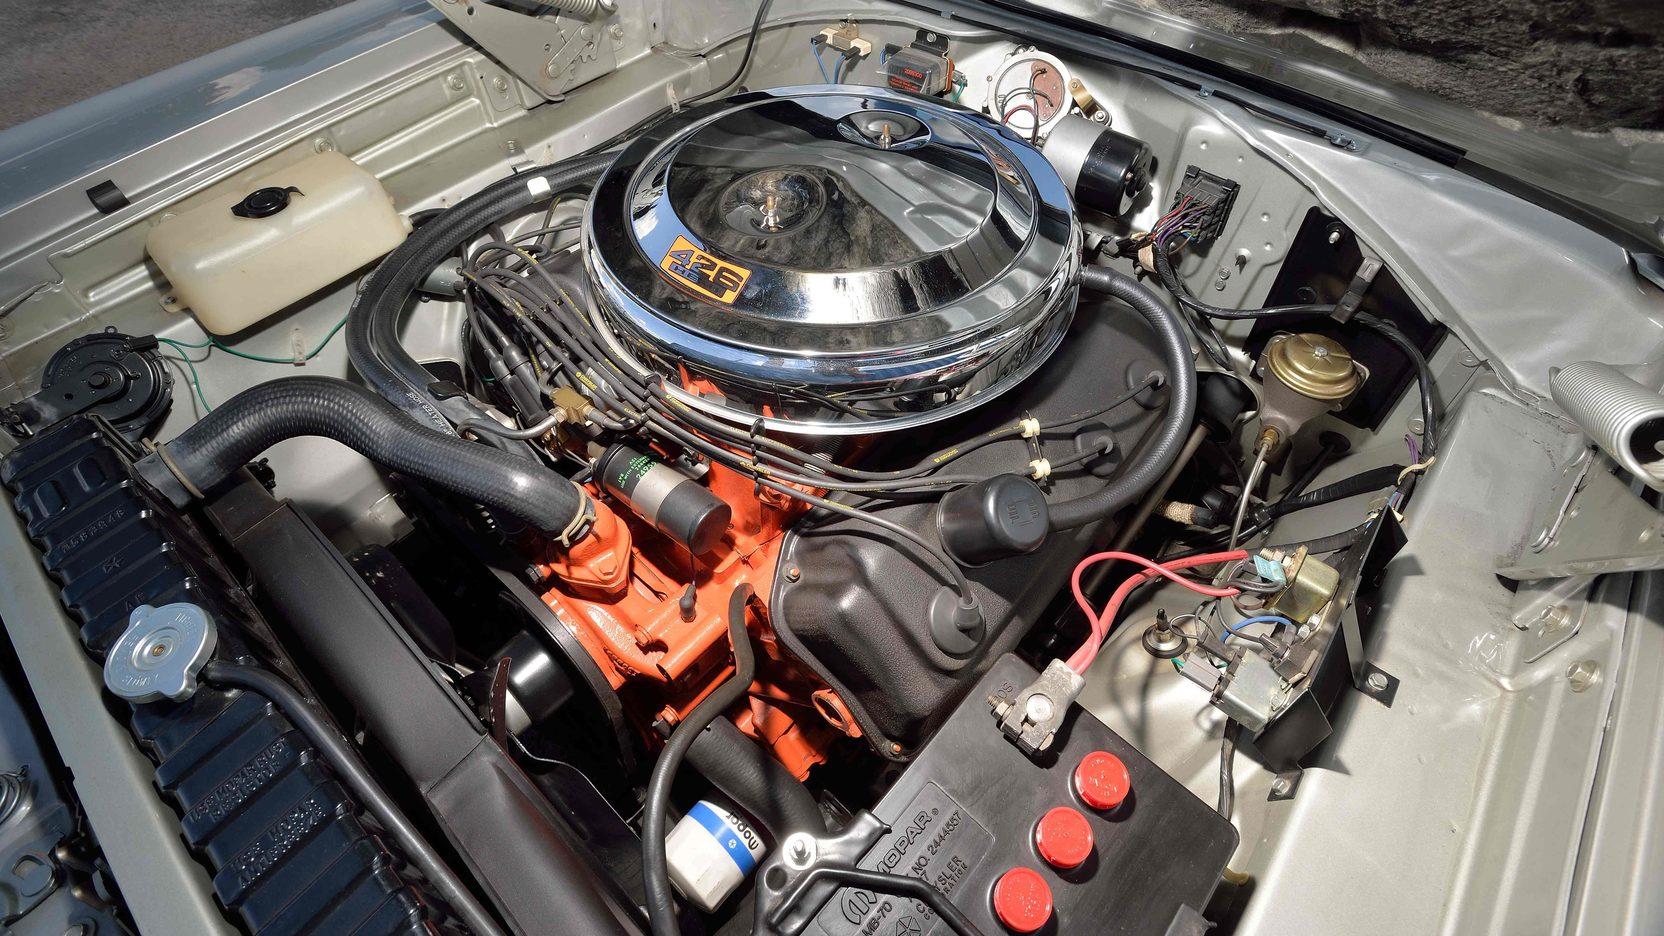 1966 Plymouth Belvedere II 426 Hemi